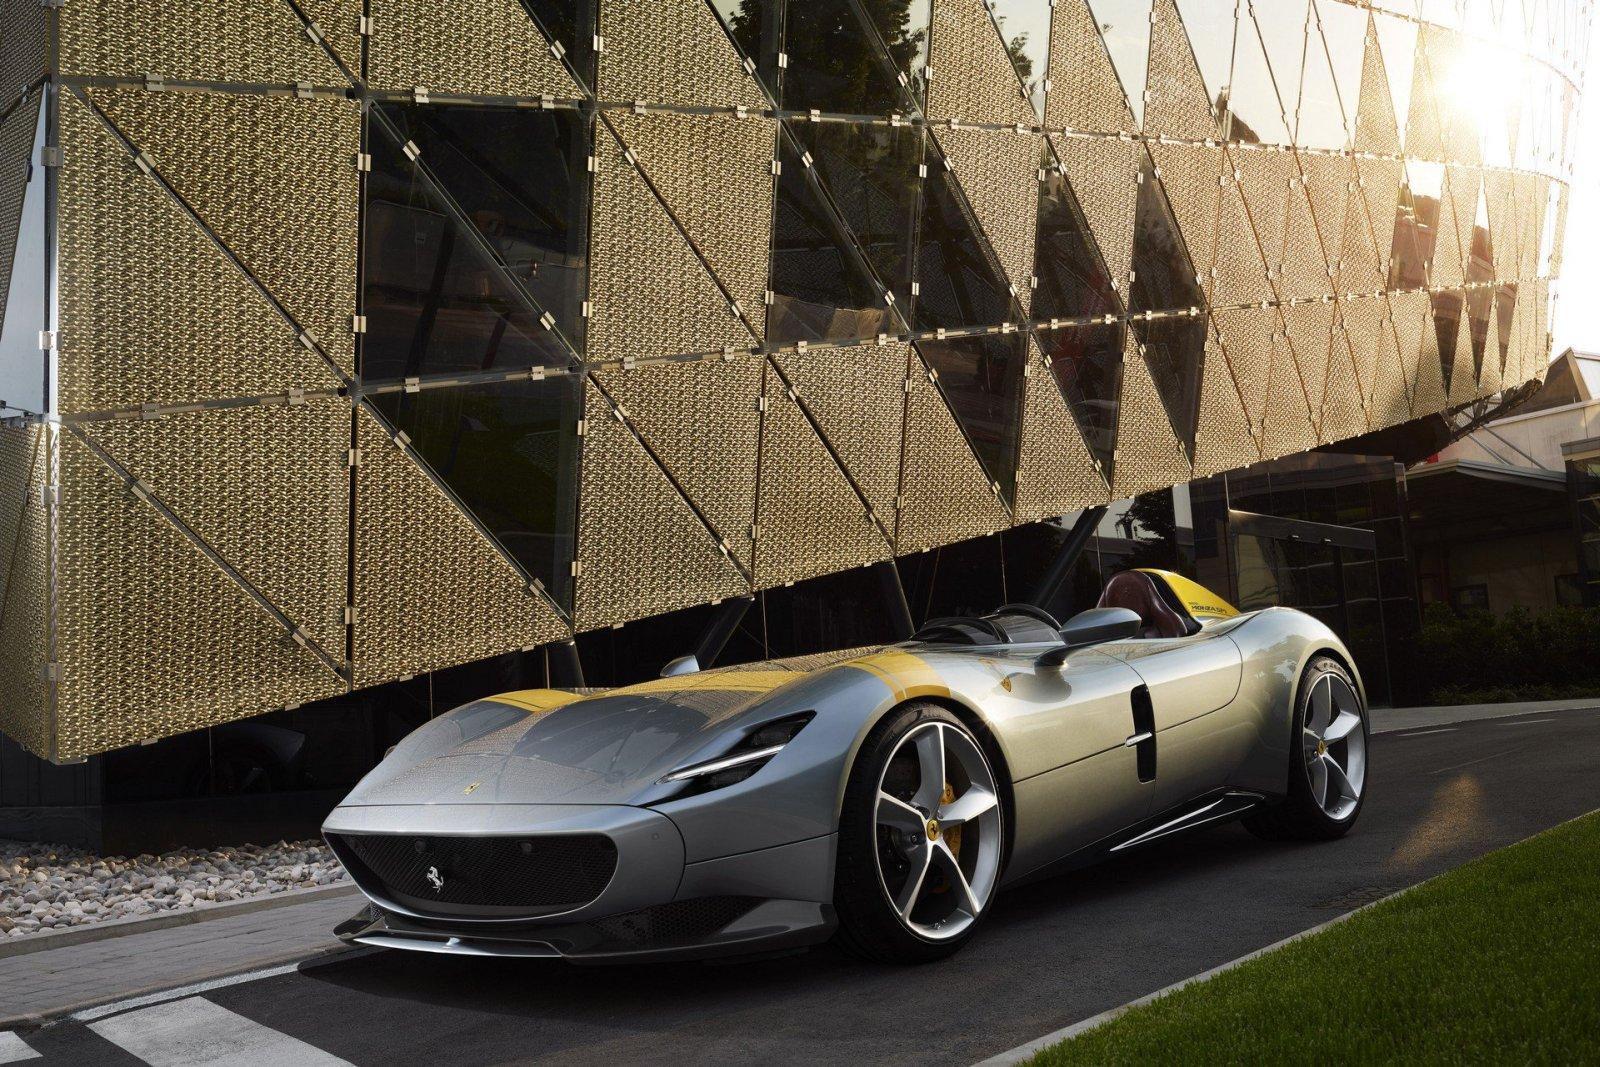 Ferrari Monza SP1 a SP2, limitka s najsilnejším V12